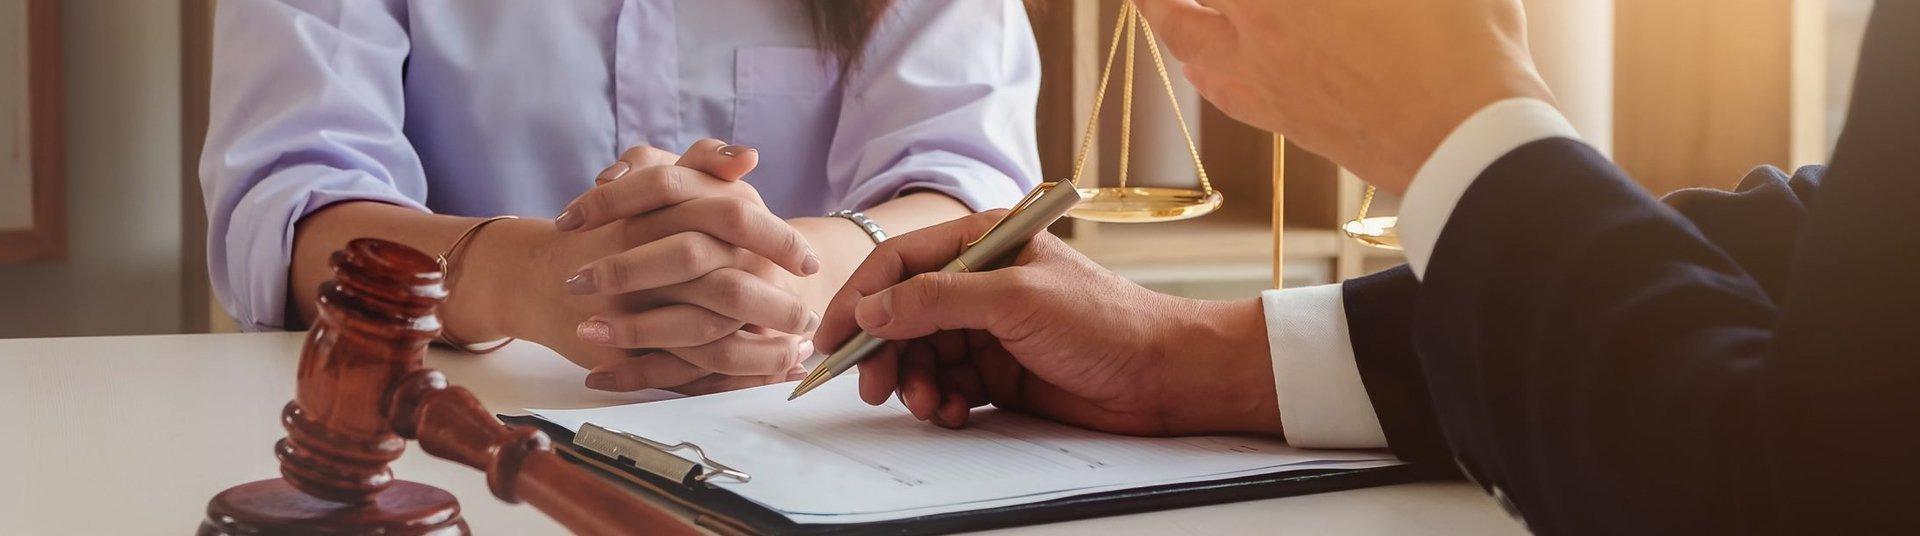 Tshibuabua & Partners - Bureau d'avocats